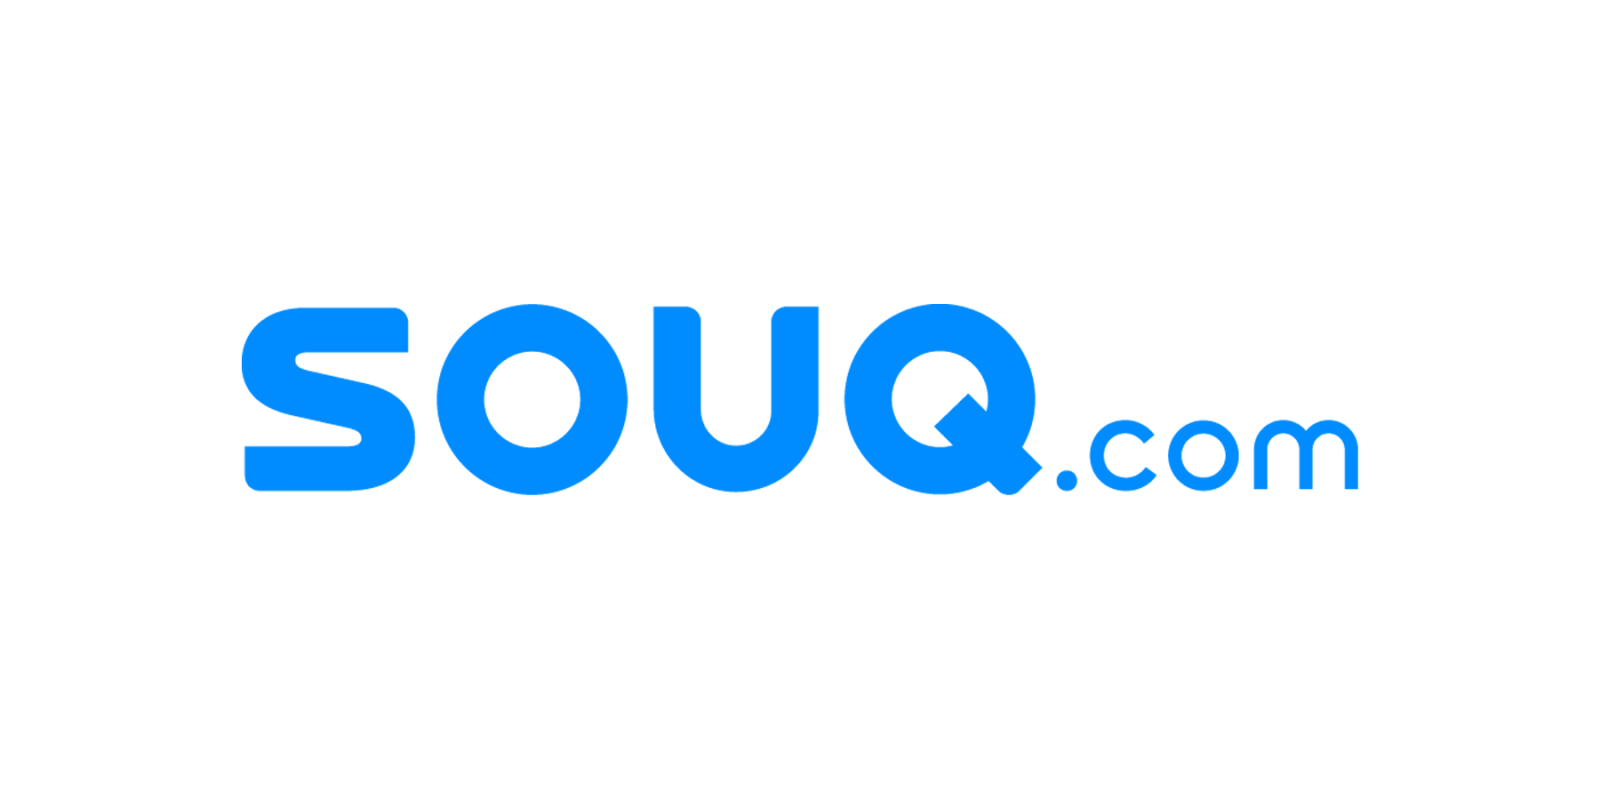 عوامل نجاح موقع سوق كوم Souq.com عوامل نجاح موقع سوق كوم souq.com عوامل نجاح موقع سوق كوم Souq.com 48